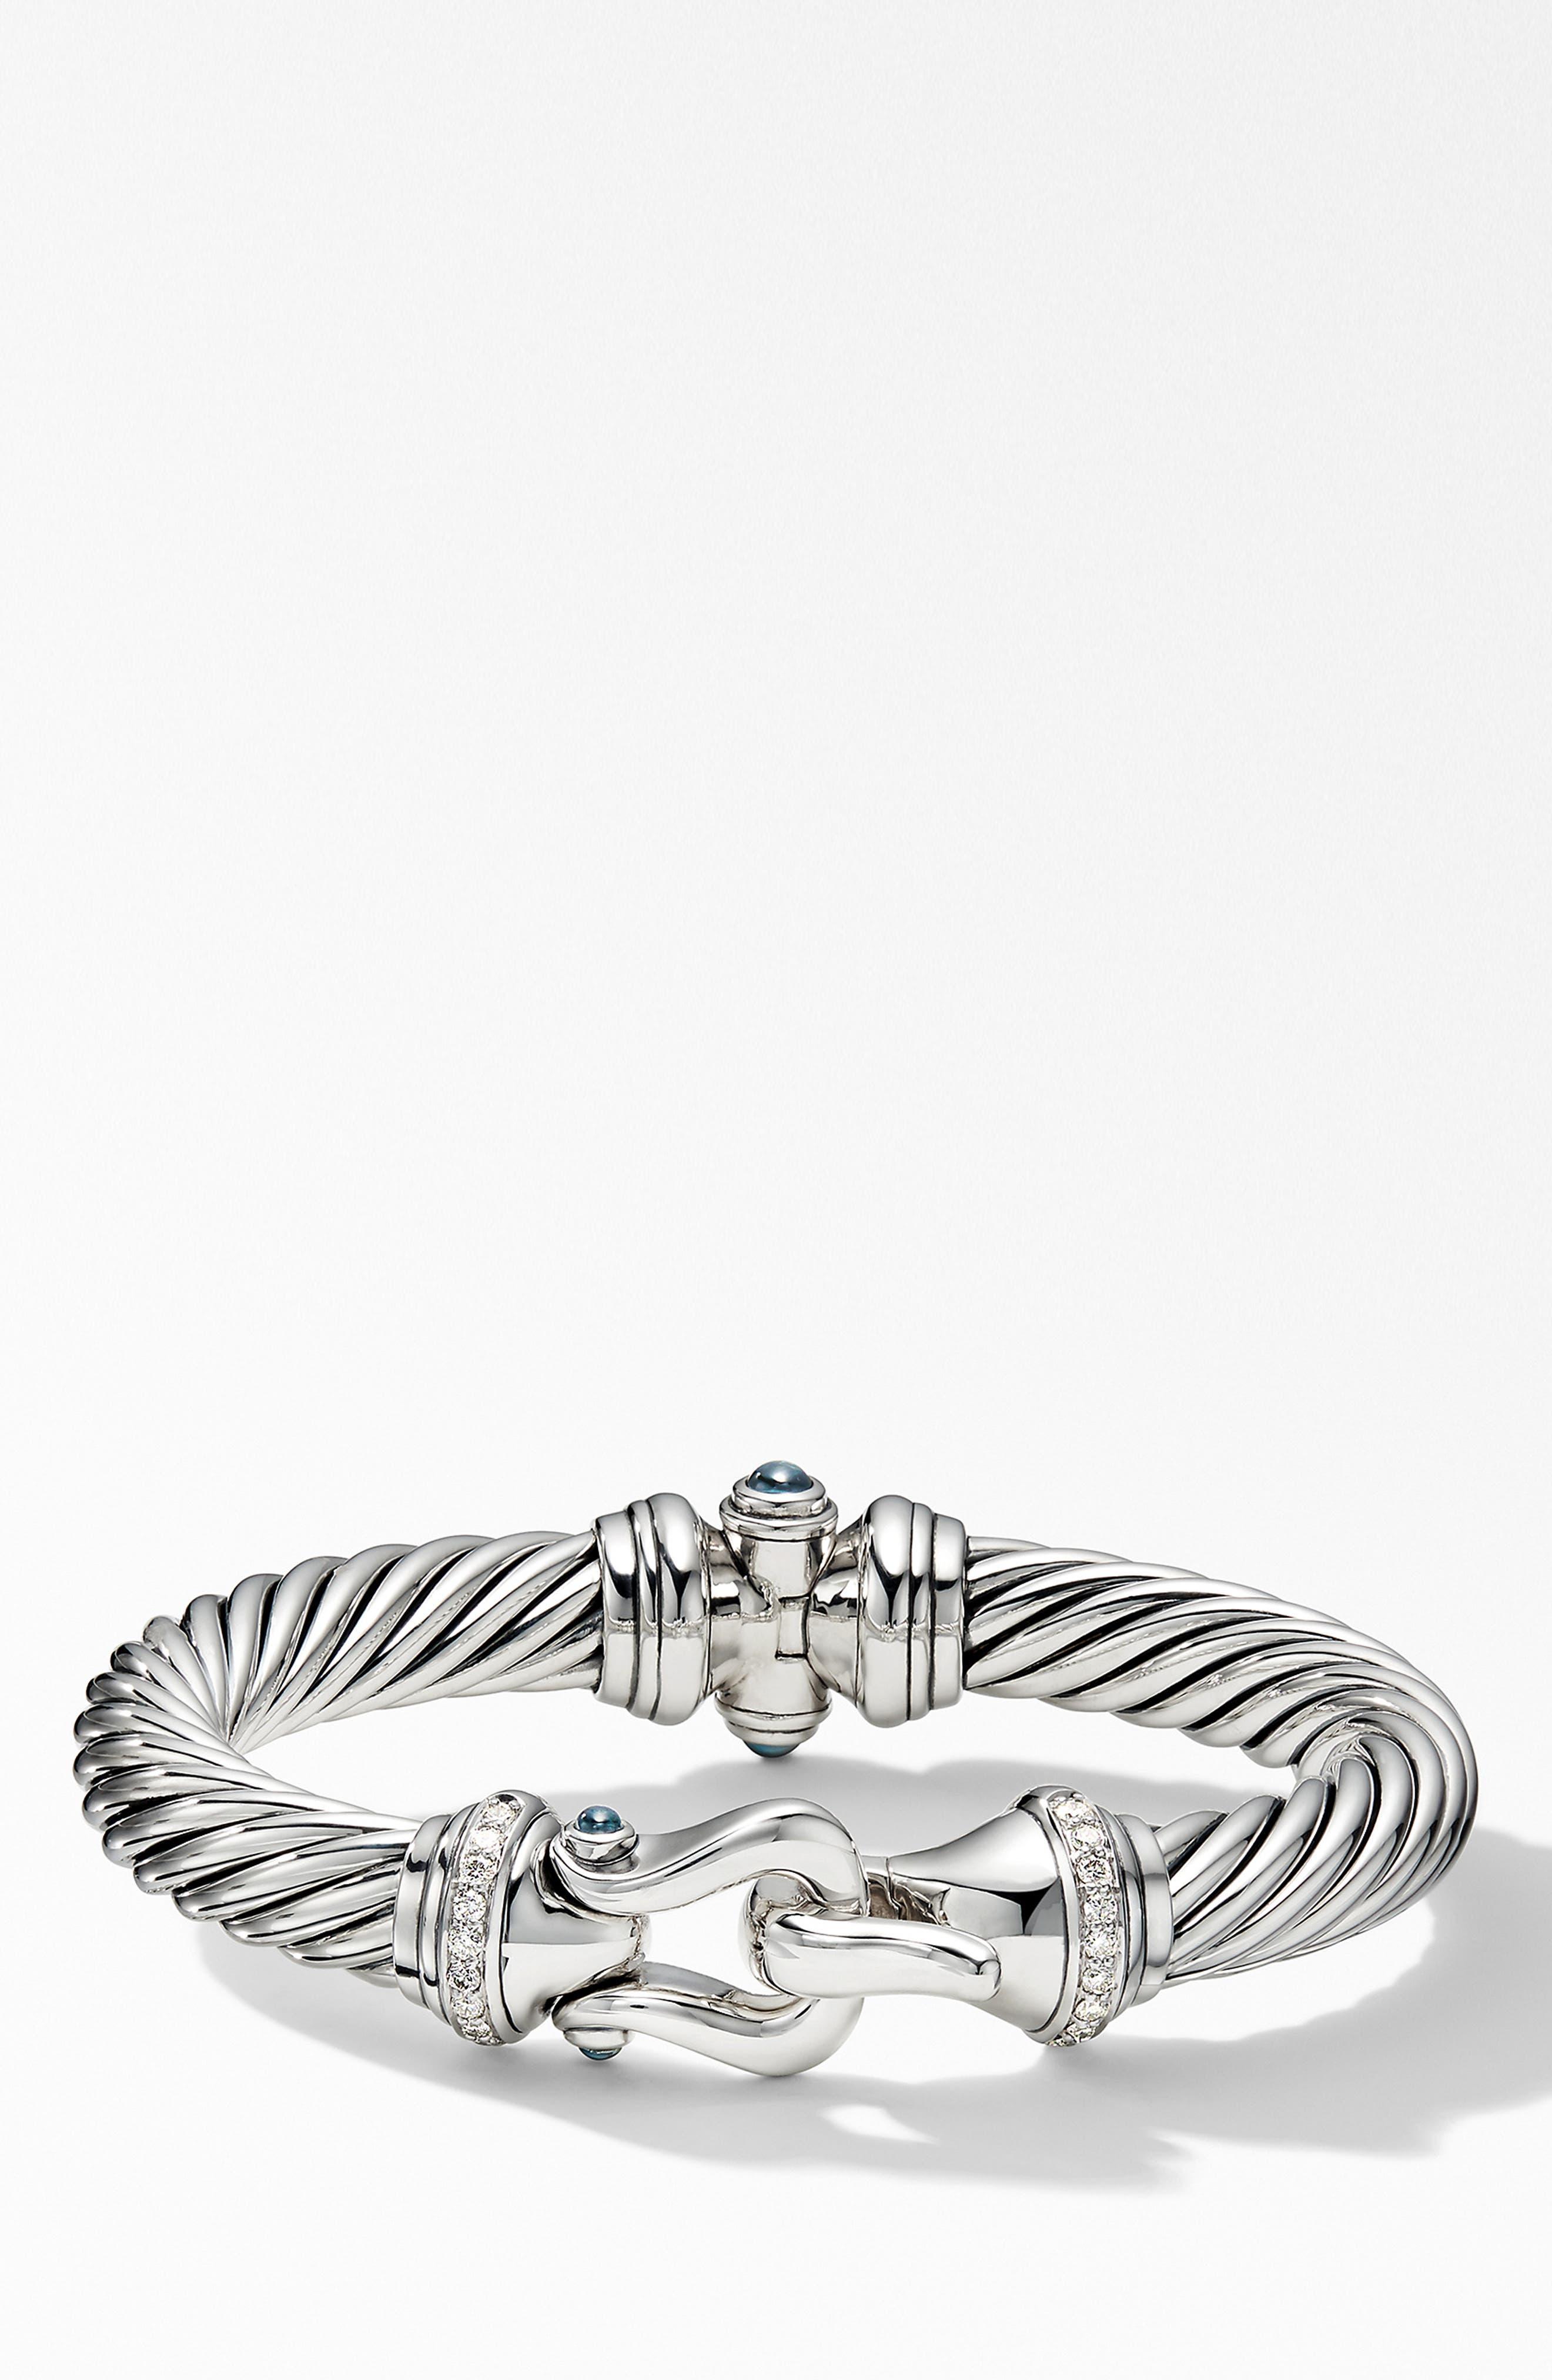 DAVID YURMAN, Cable Buckle Bracelet with Diamonds, Main thumbnail 1, color, HAMPTON BLUE TOPAZ